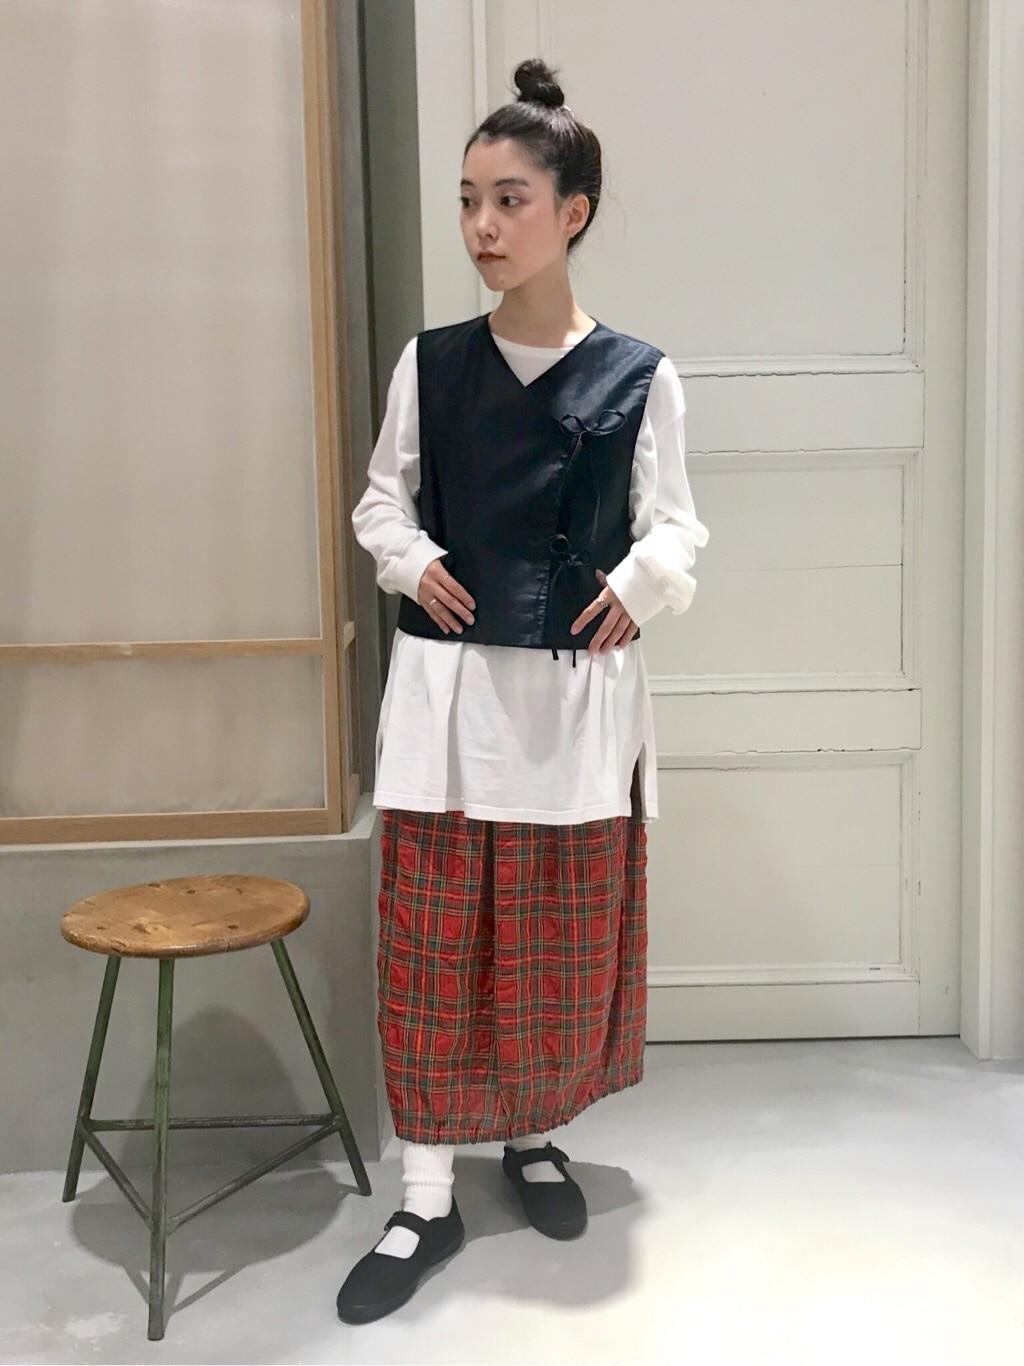 bulle de savon 渋谷スクランブルスクエア 身長:153cm 2020.10.02